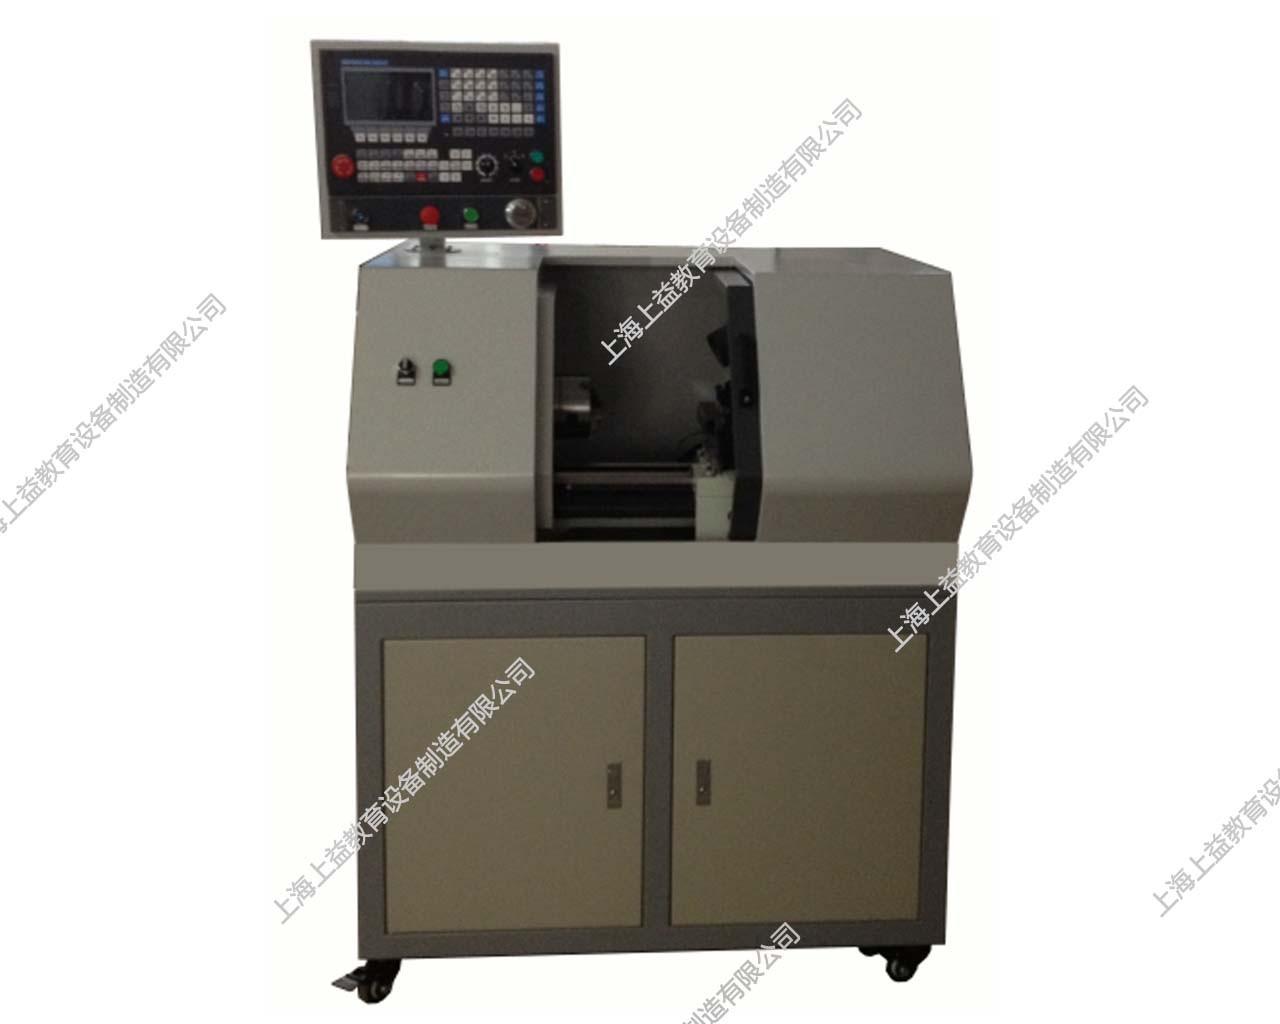 SY-CK0625型 教学/生产二用型数控车床